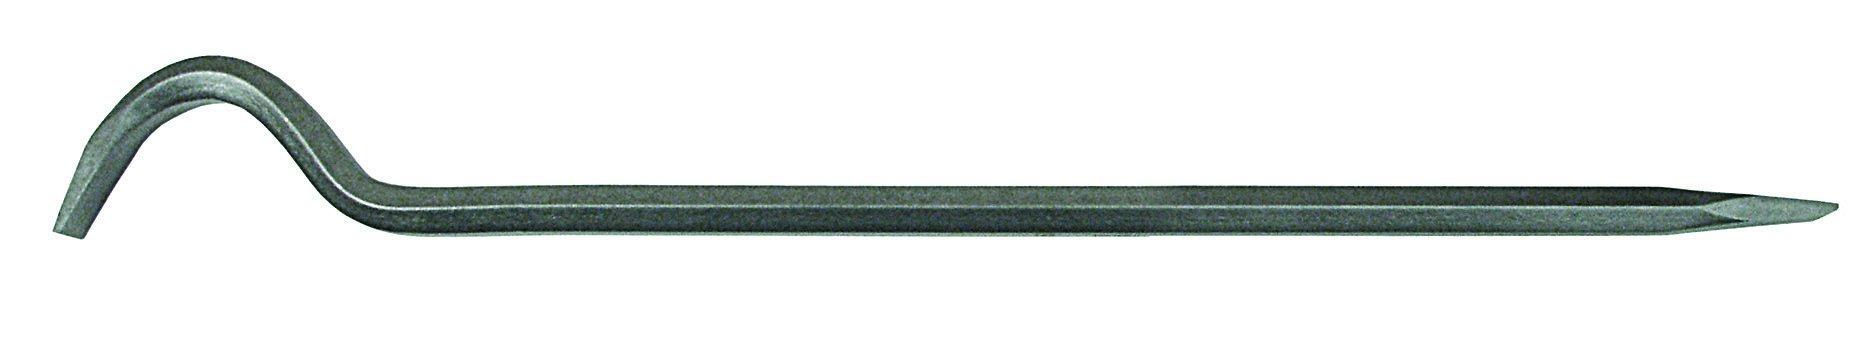 Mayhew Pro 41280 Black Oxide Finish Die Separating Bar